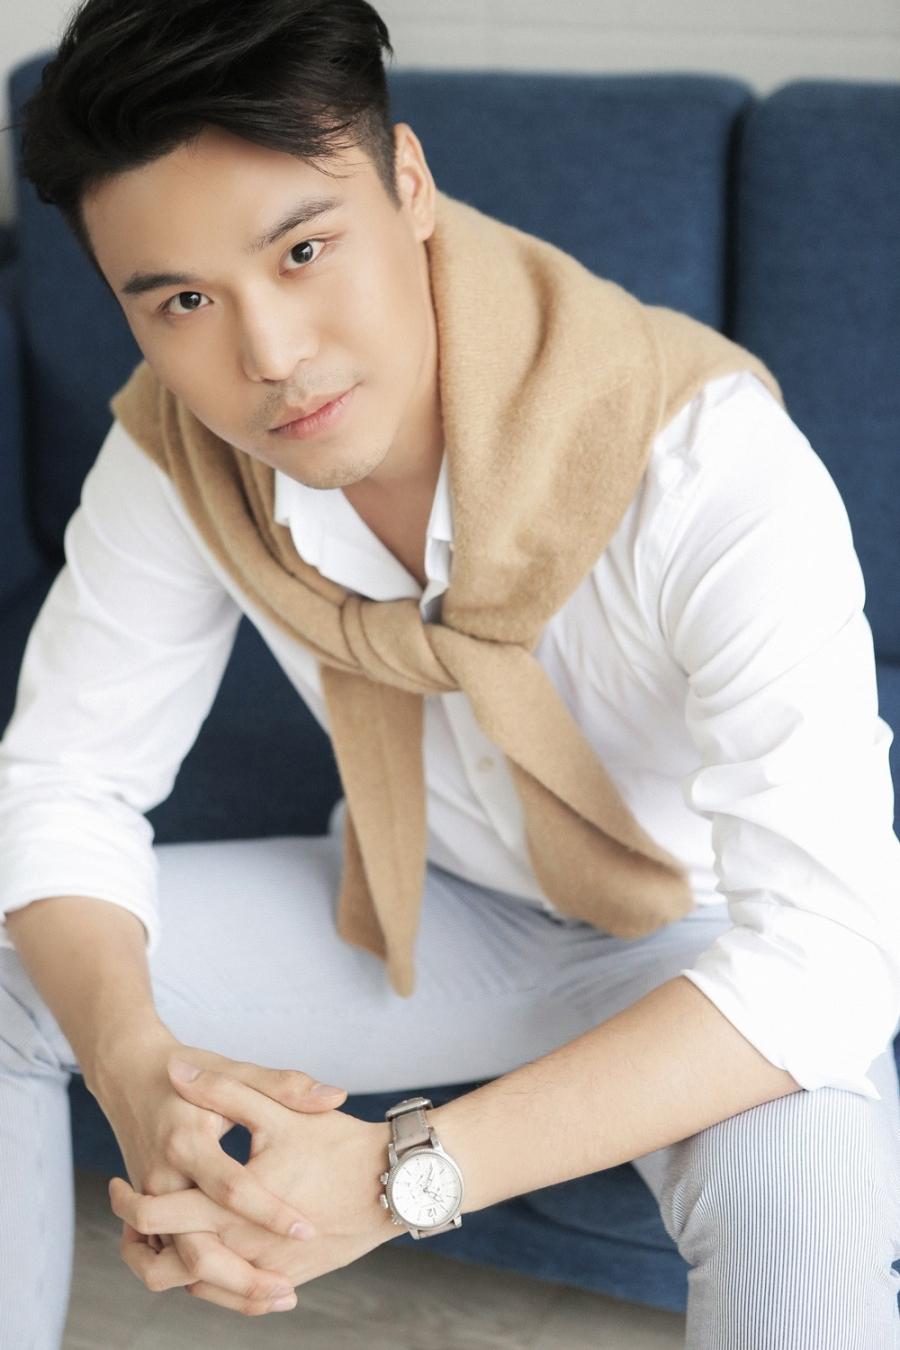 9X dien trai lam giam doc sang tao show dien de doi cho Mr. Dam la ai? hinh anh 8